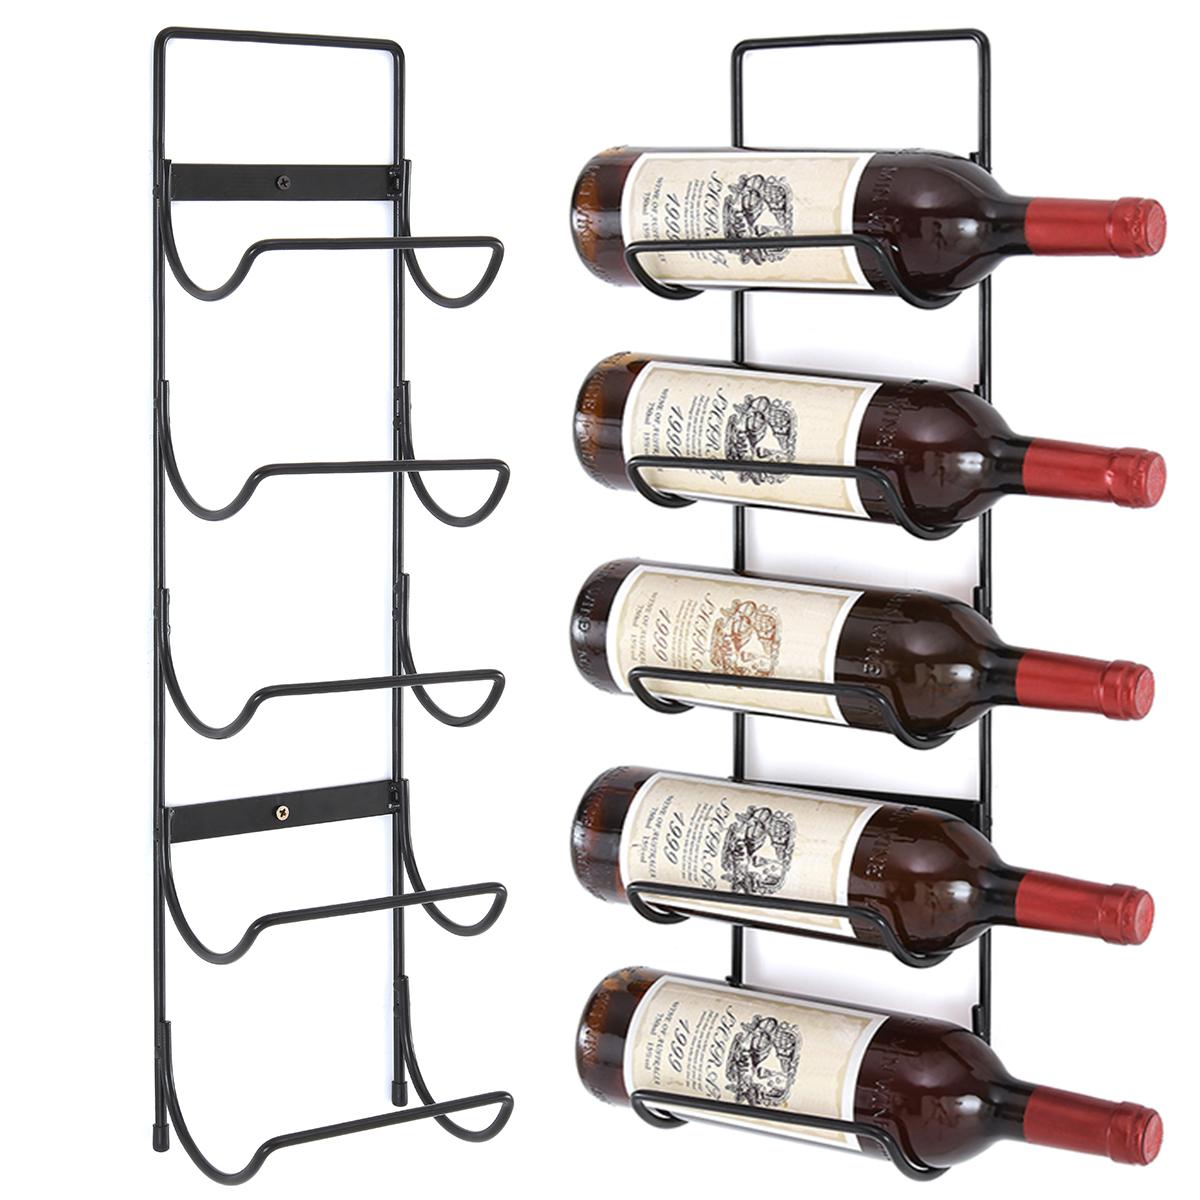 5 Wall Mounted Black Metal Wine Rack Towel Champagne Bottles Holder Storage Ebay